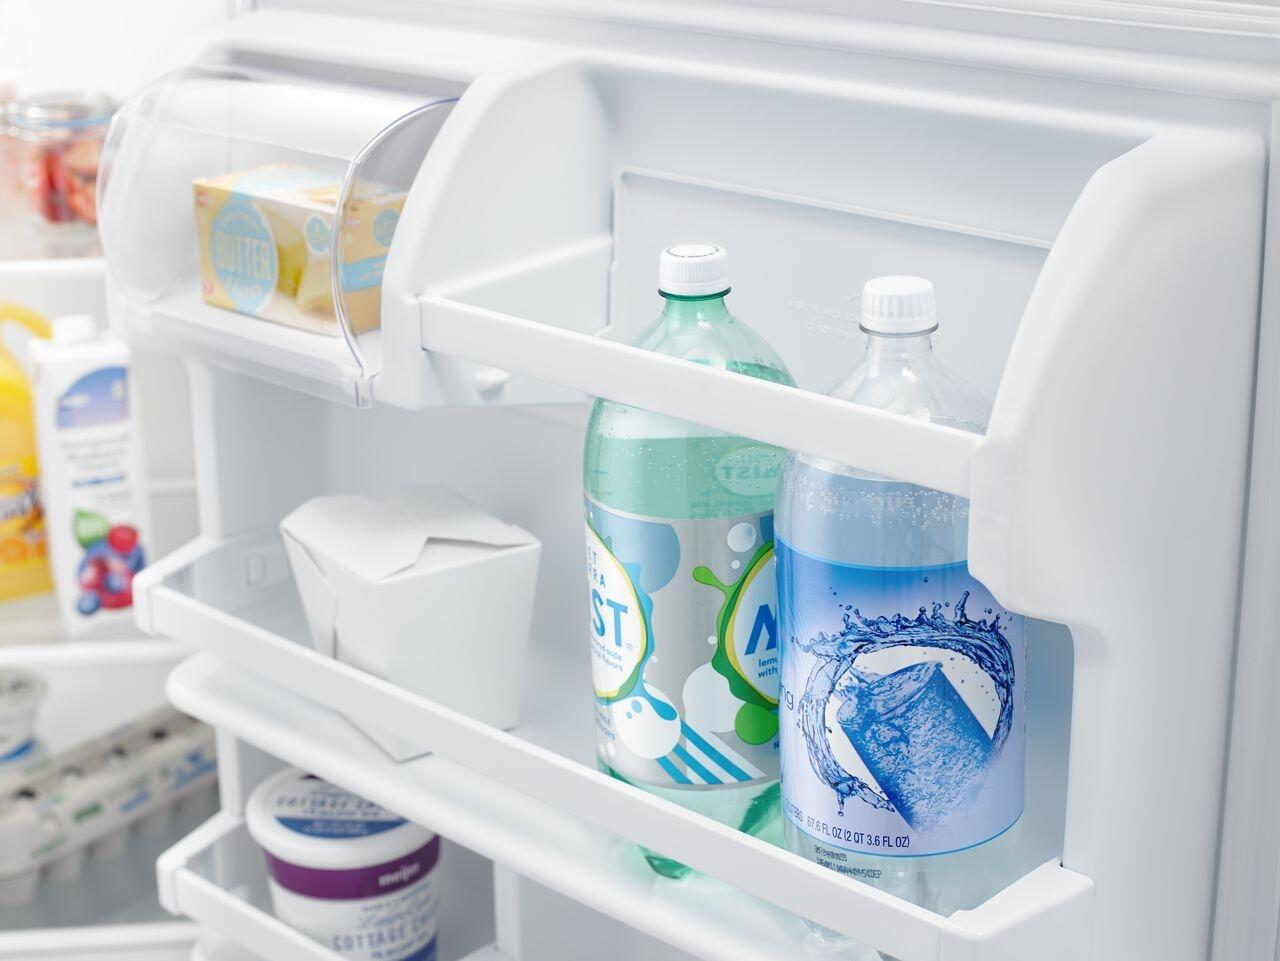 Amana Art318ffdw 30 Inch White Refrigerator With 182 Cu Ft Wiring Diagram On Oil Furnace Older 4